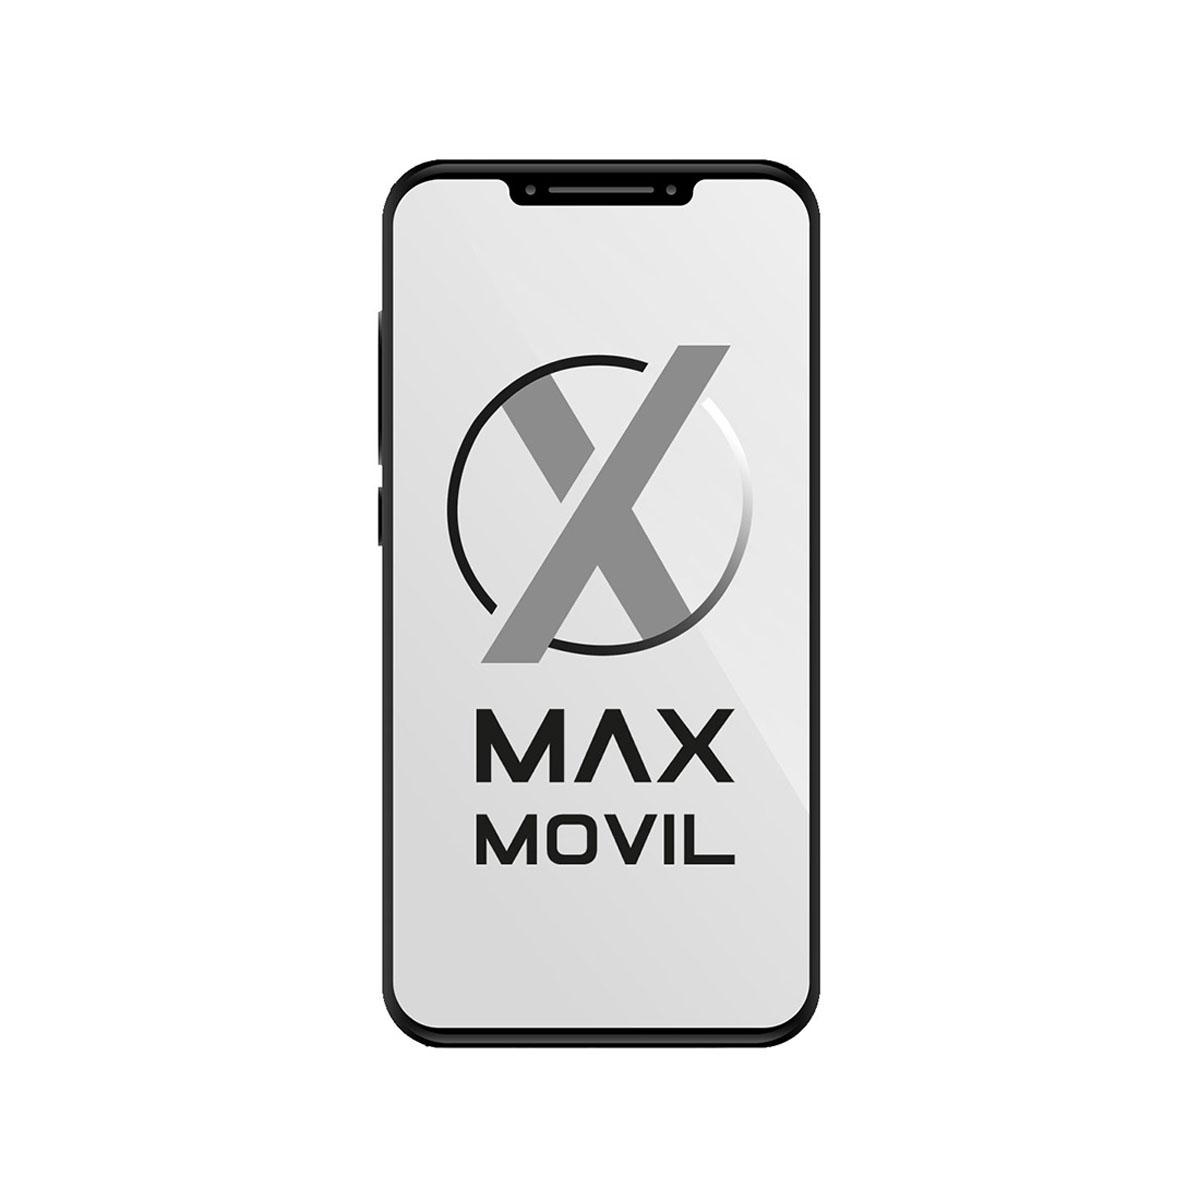 Protector de pantalla de cristal templado para iPhone X/XS/ 11 PRO